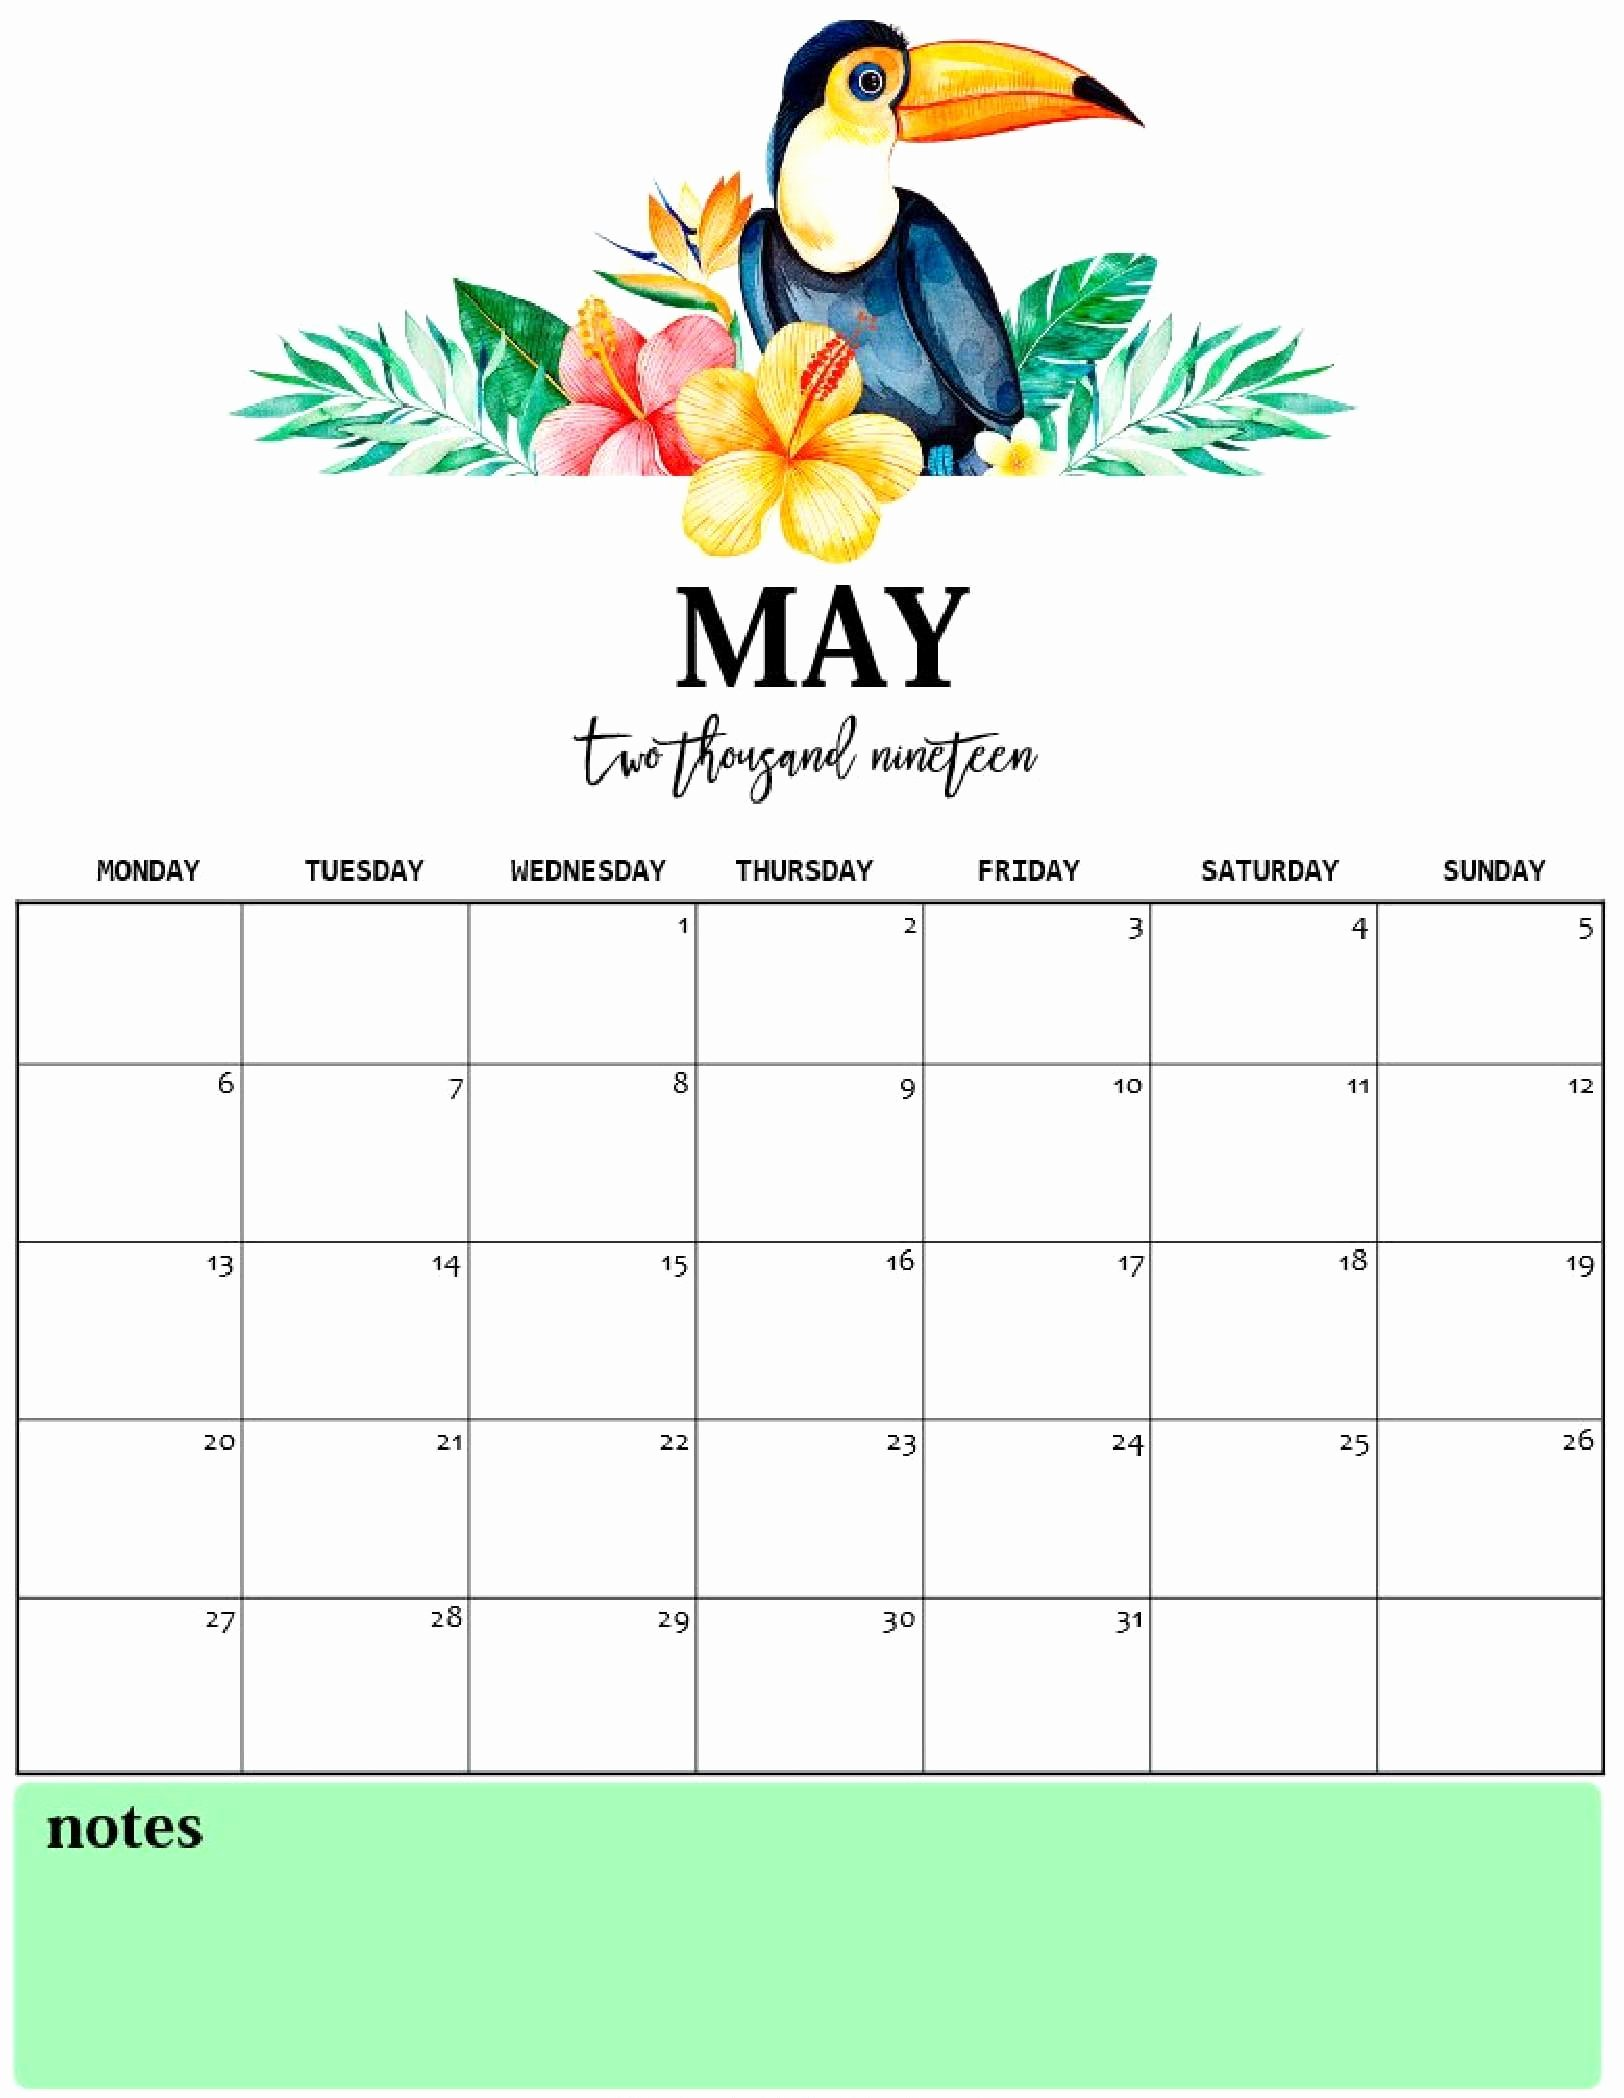 Cute Calendar Template 2019 Best Of Cute May 2019 Calendar Printable for Kids